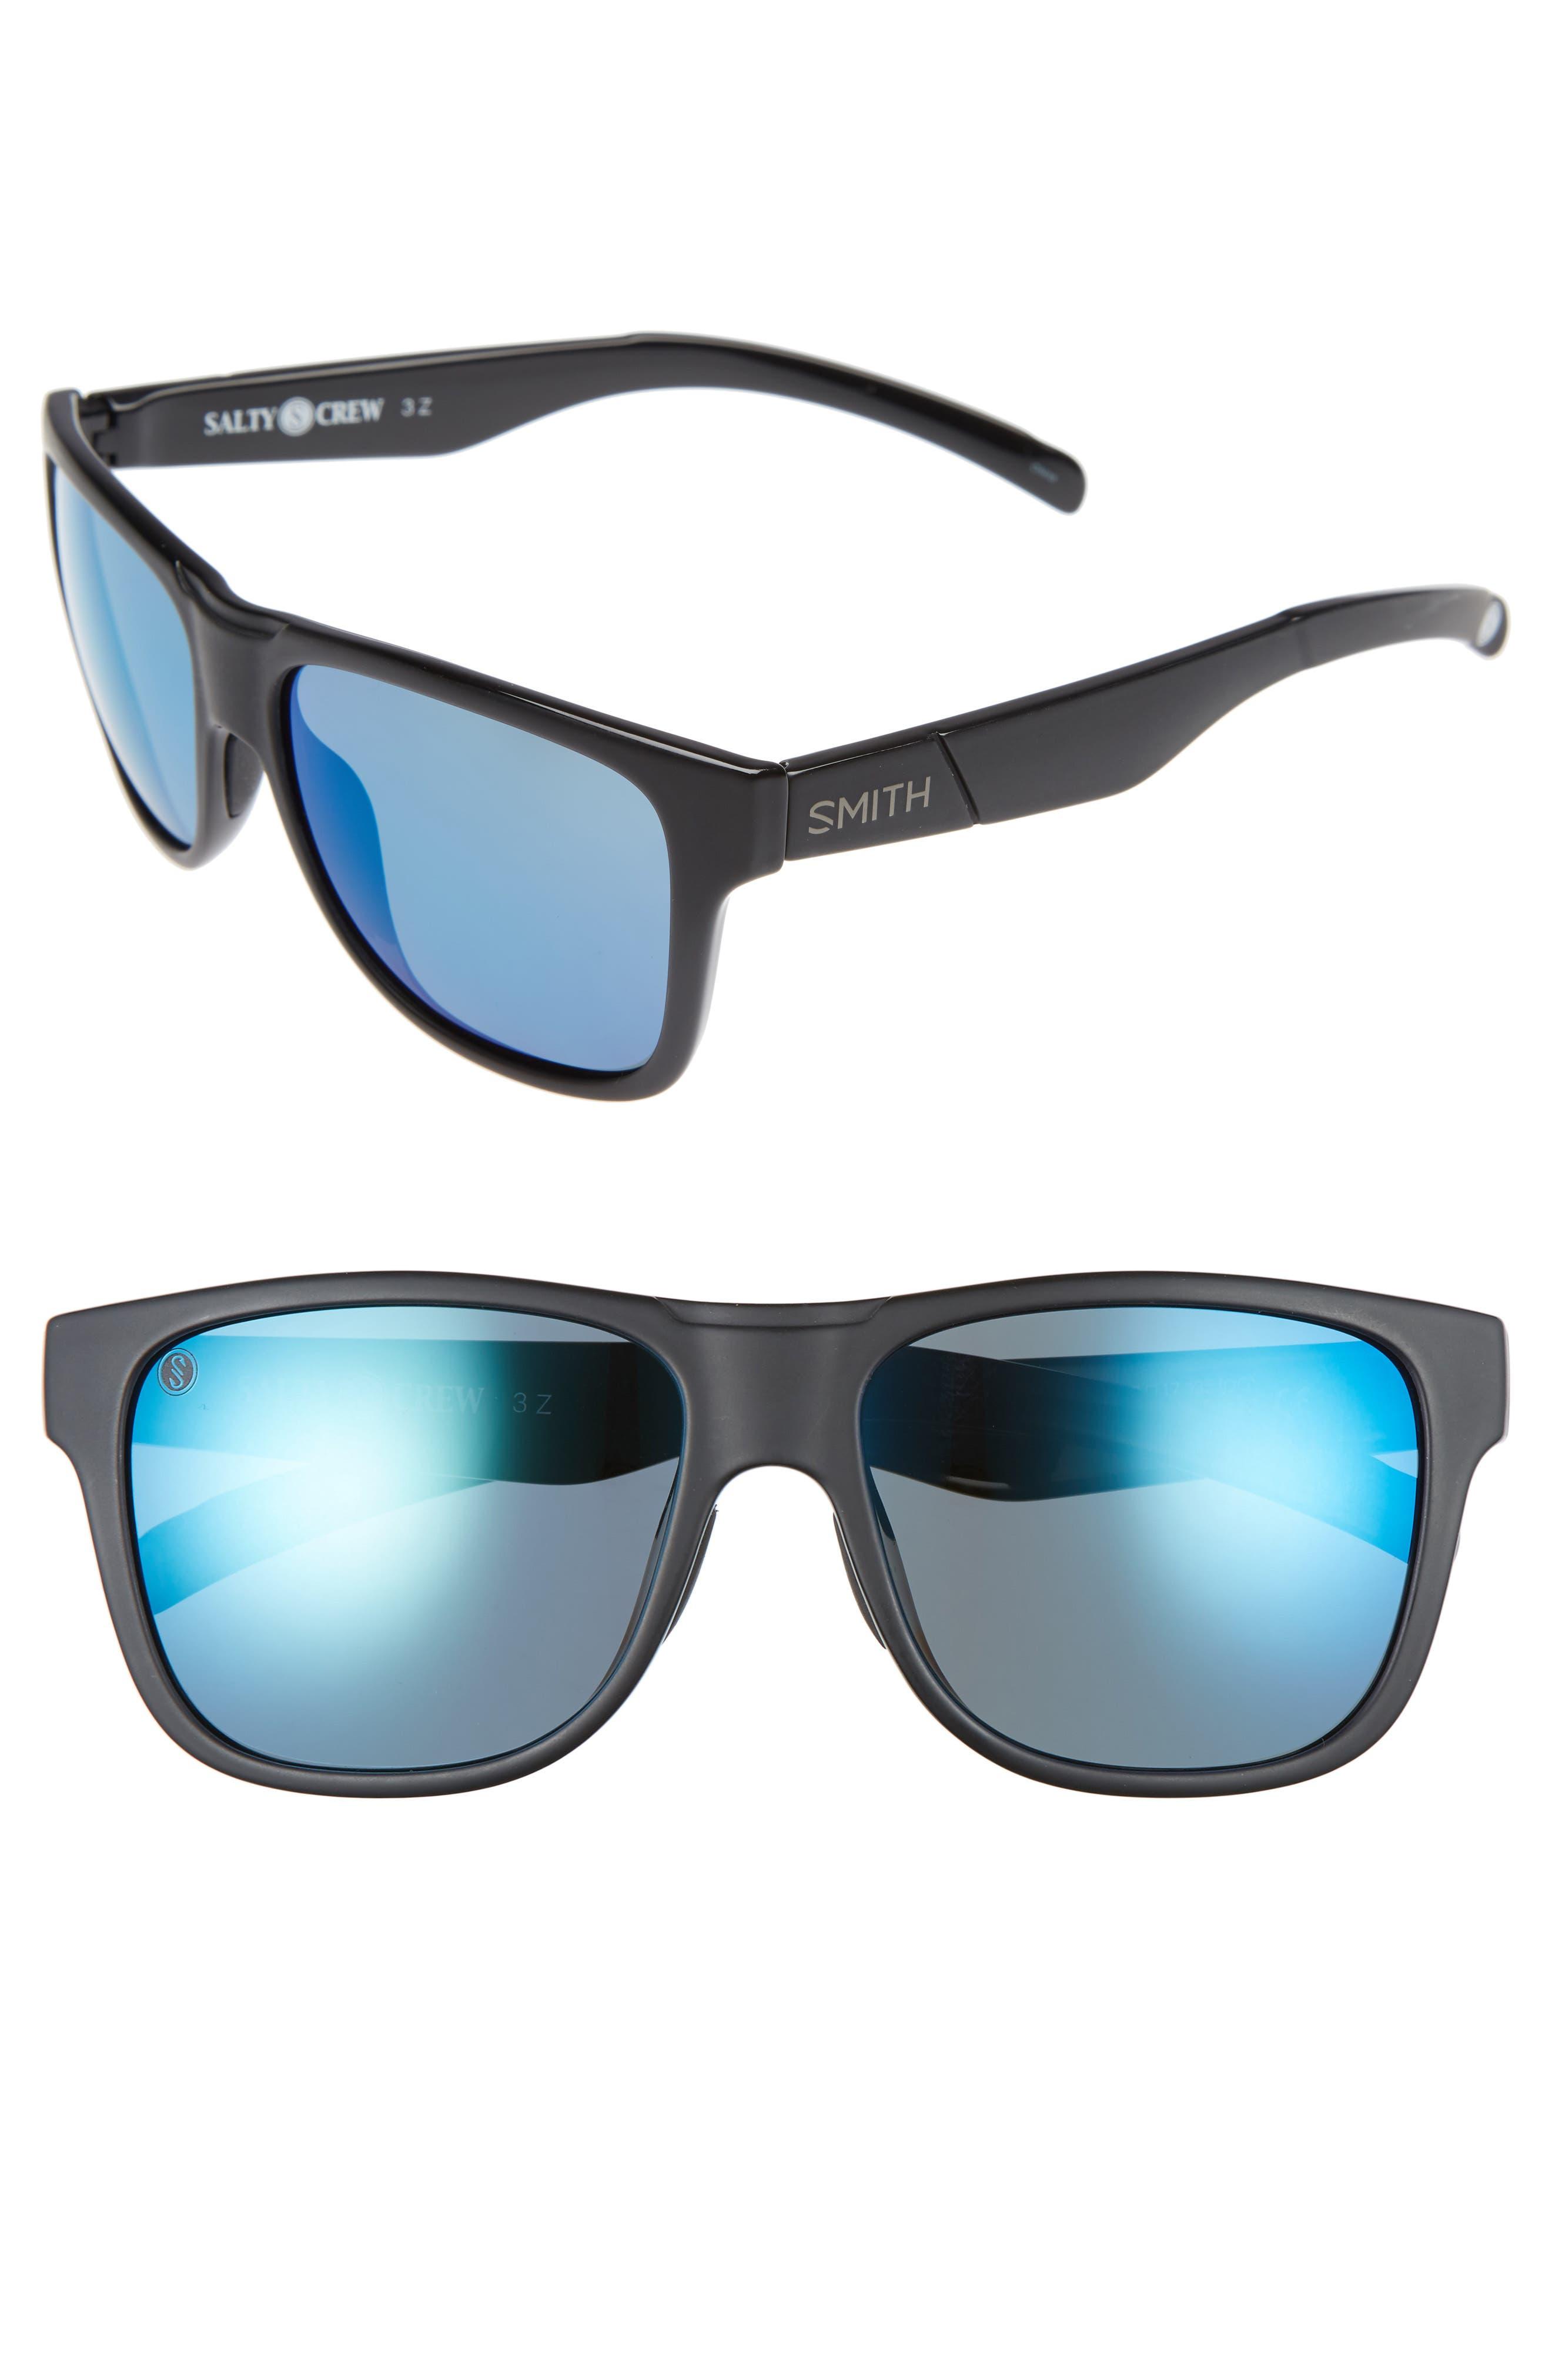 SMITH LOWDOWN XL  Designer Sunglasses with Case All Colours